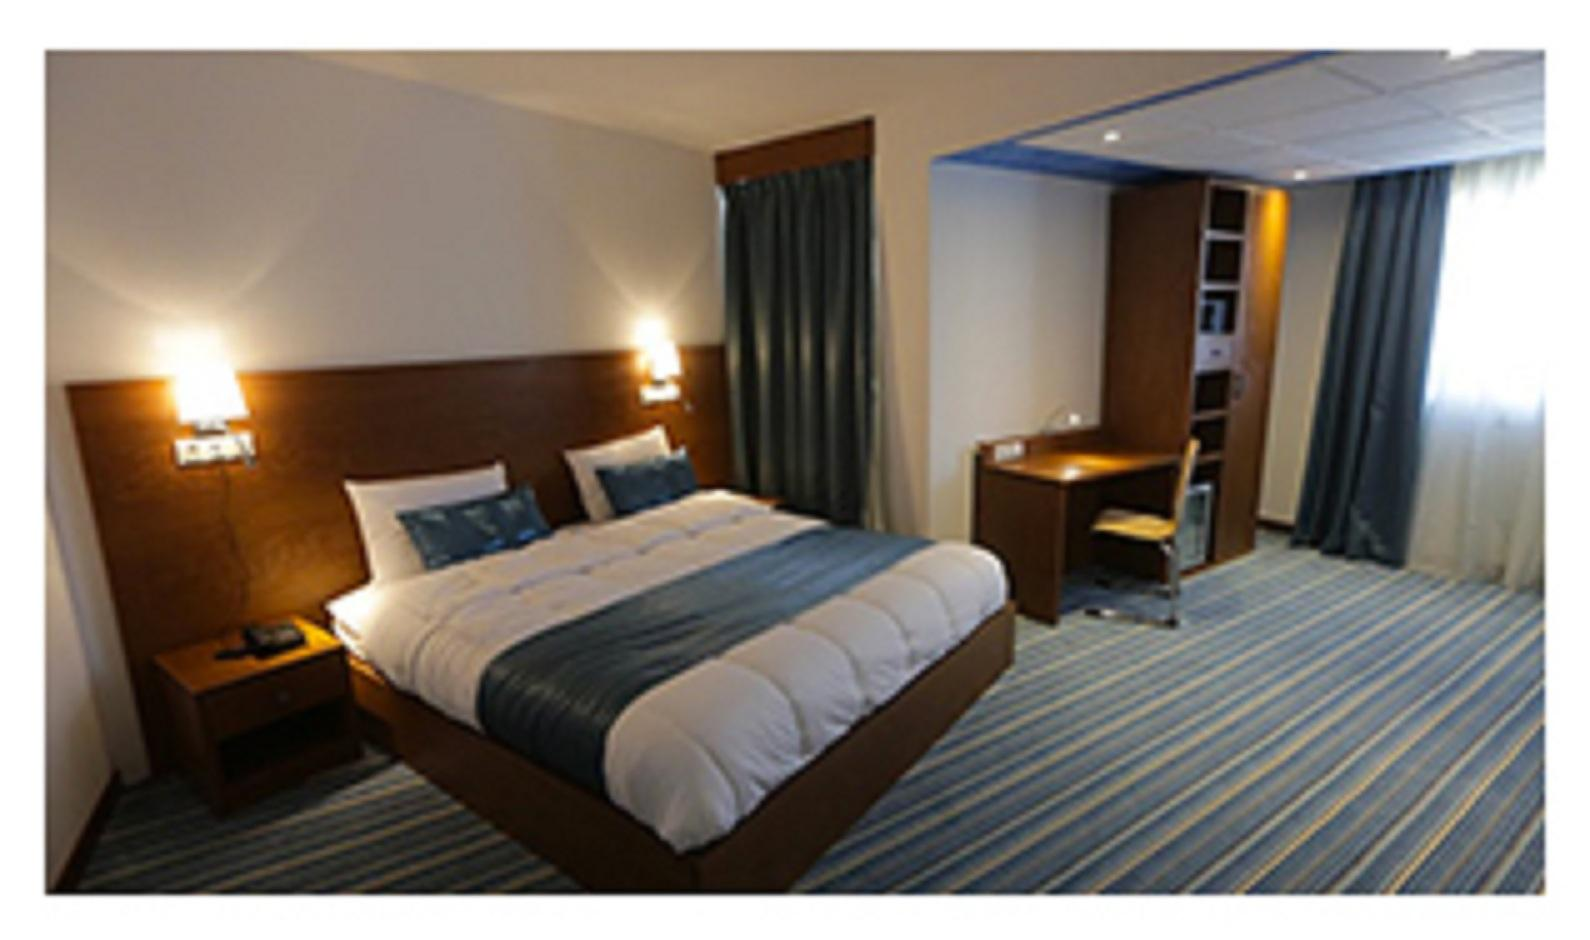 Design Furniture Bab Ezzouar 🟊🟊🟊🟊 hani hotel - bordj el kiffan - algeria